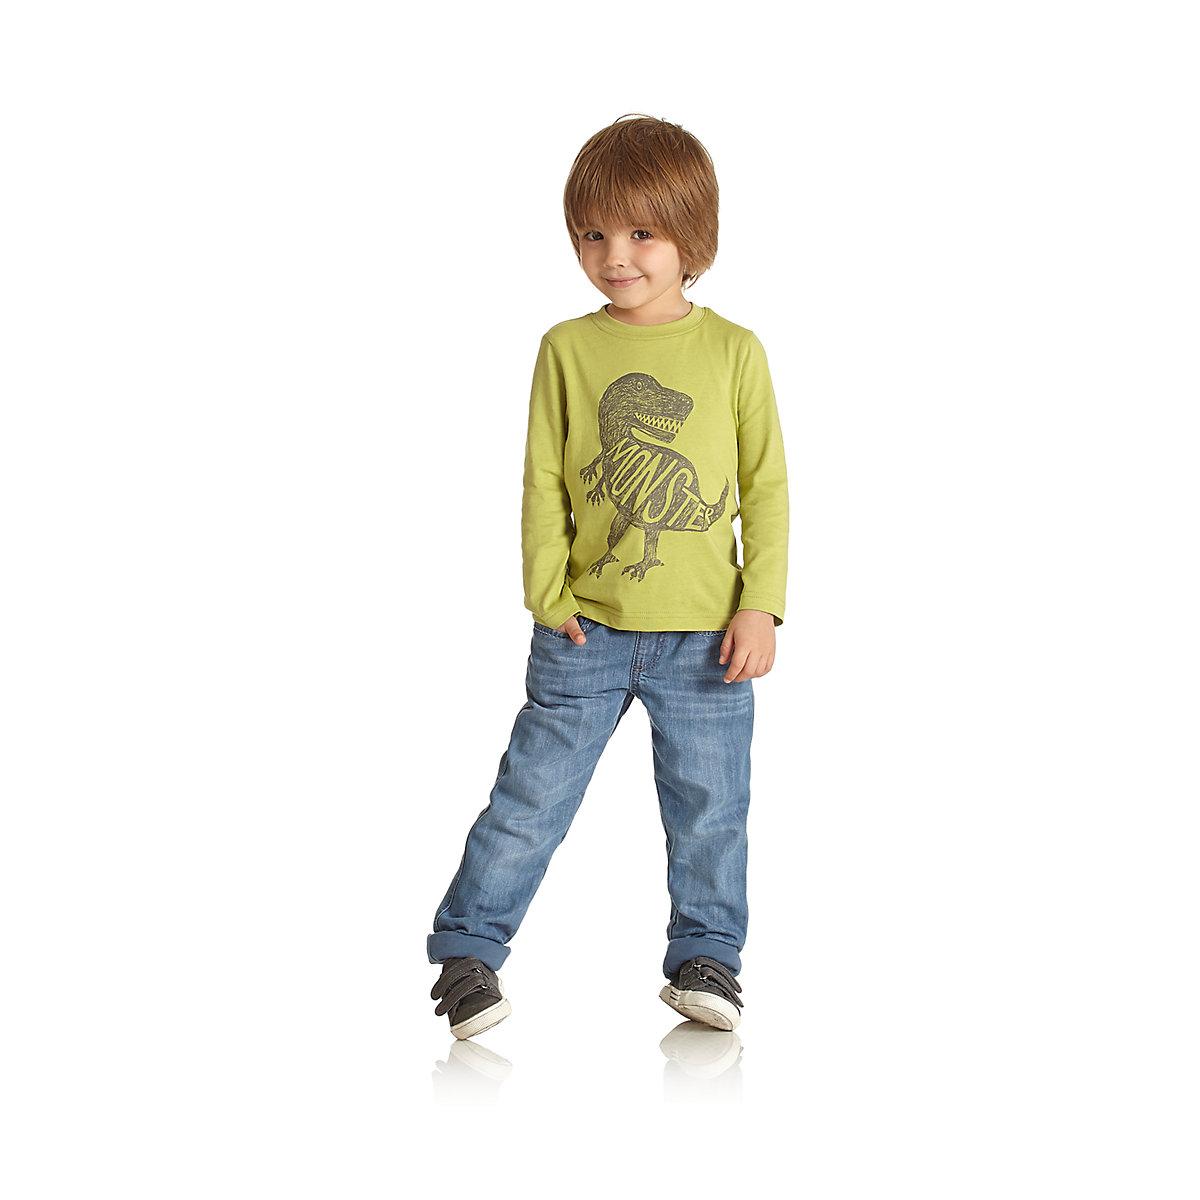 Mothercare Green Dinosaur T-Shirt - Dinosaur Gifts